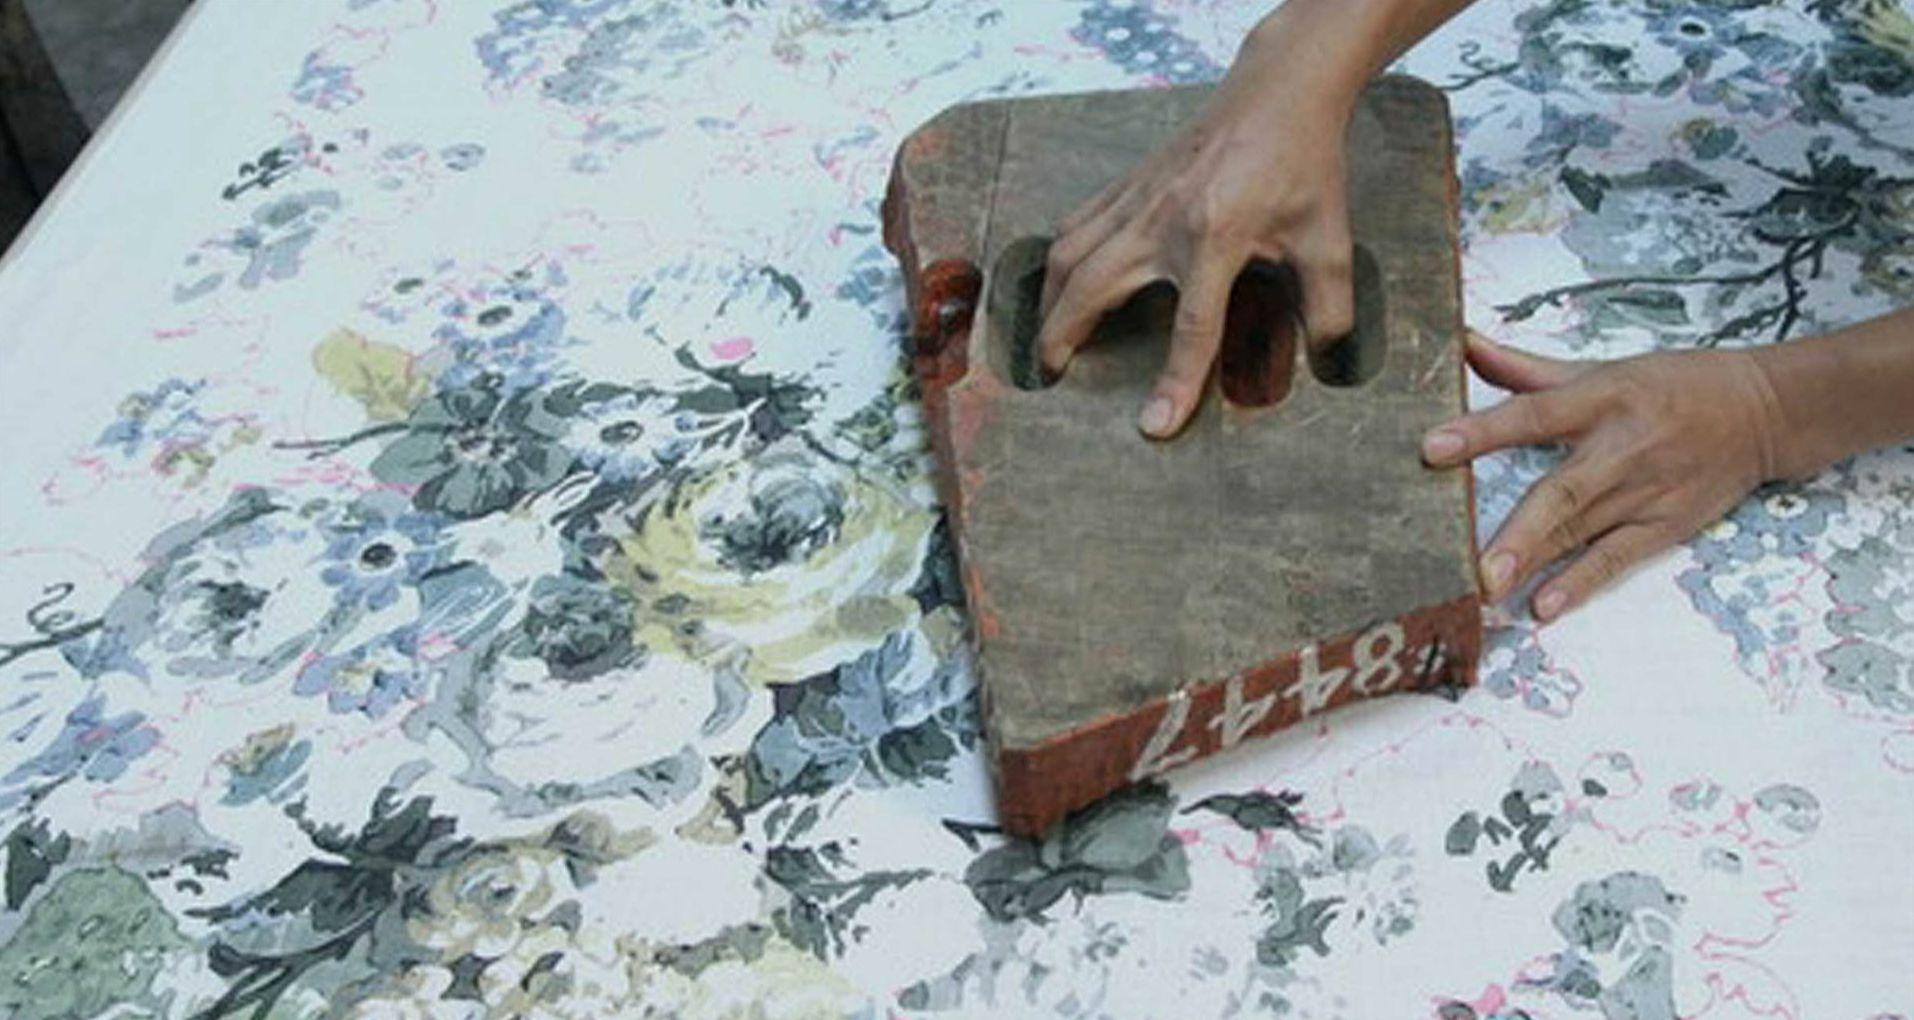 The making of Handblocks